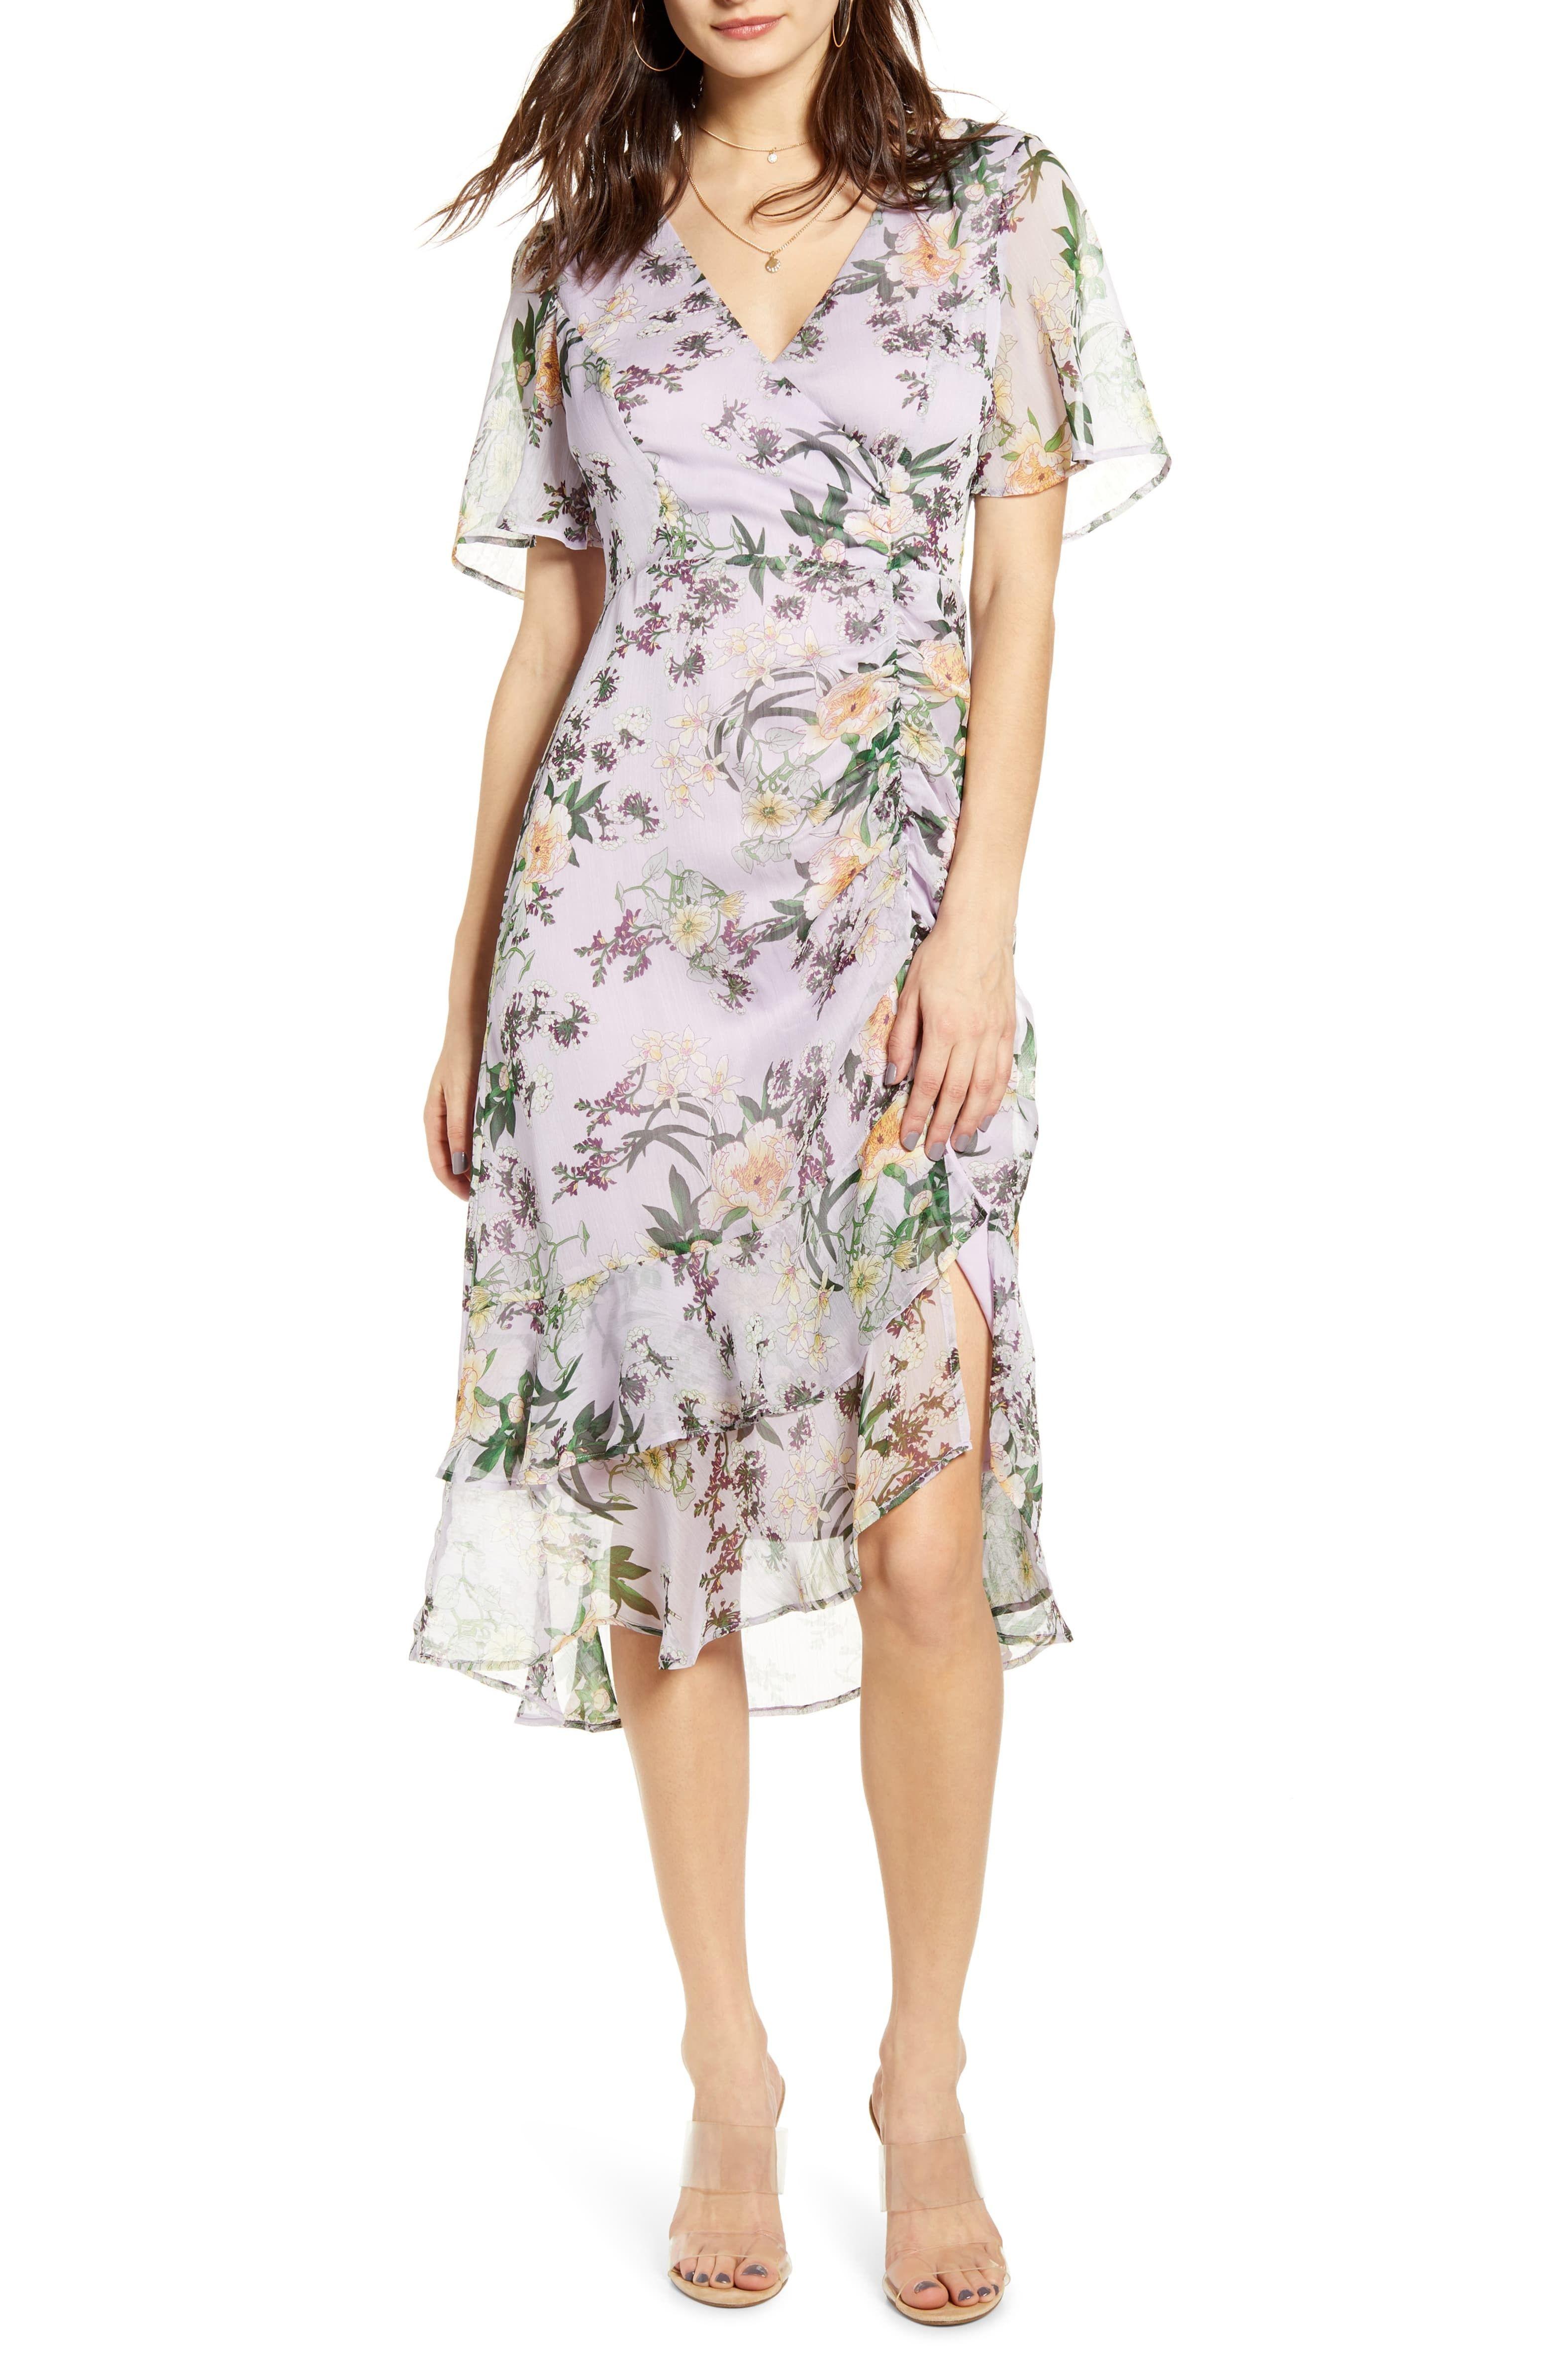 Lavender Floral Print Dress For A Garden Wedding Wedding Guest Dresses Commissionlink Weddingguest Weddingguest Fashion Clothes Women Dresses Guest Dresses [ 4784 x 3120 Pixel ]